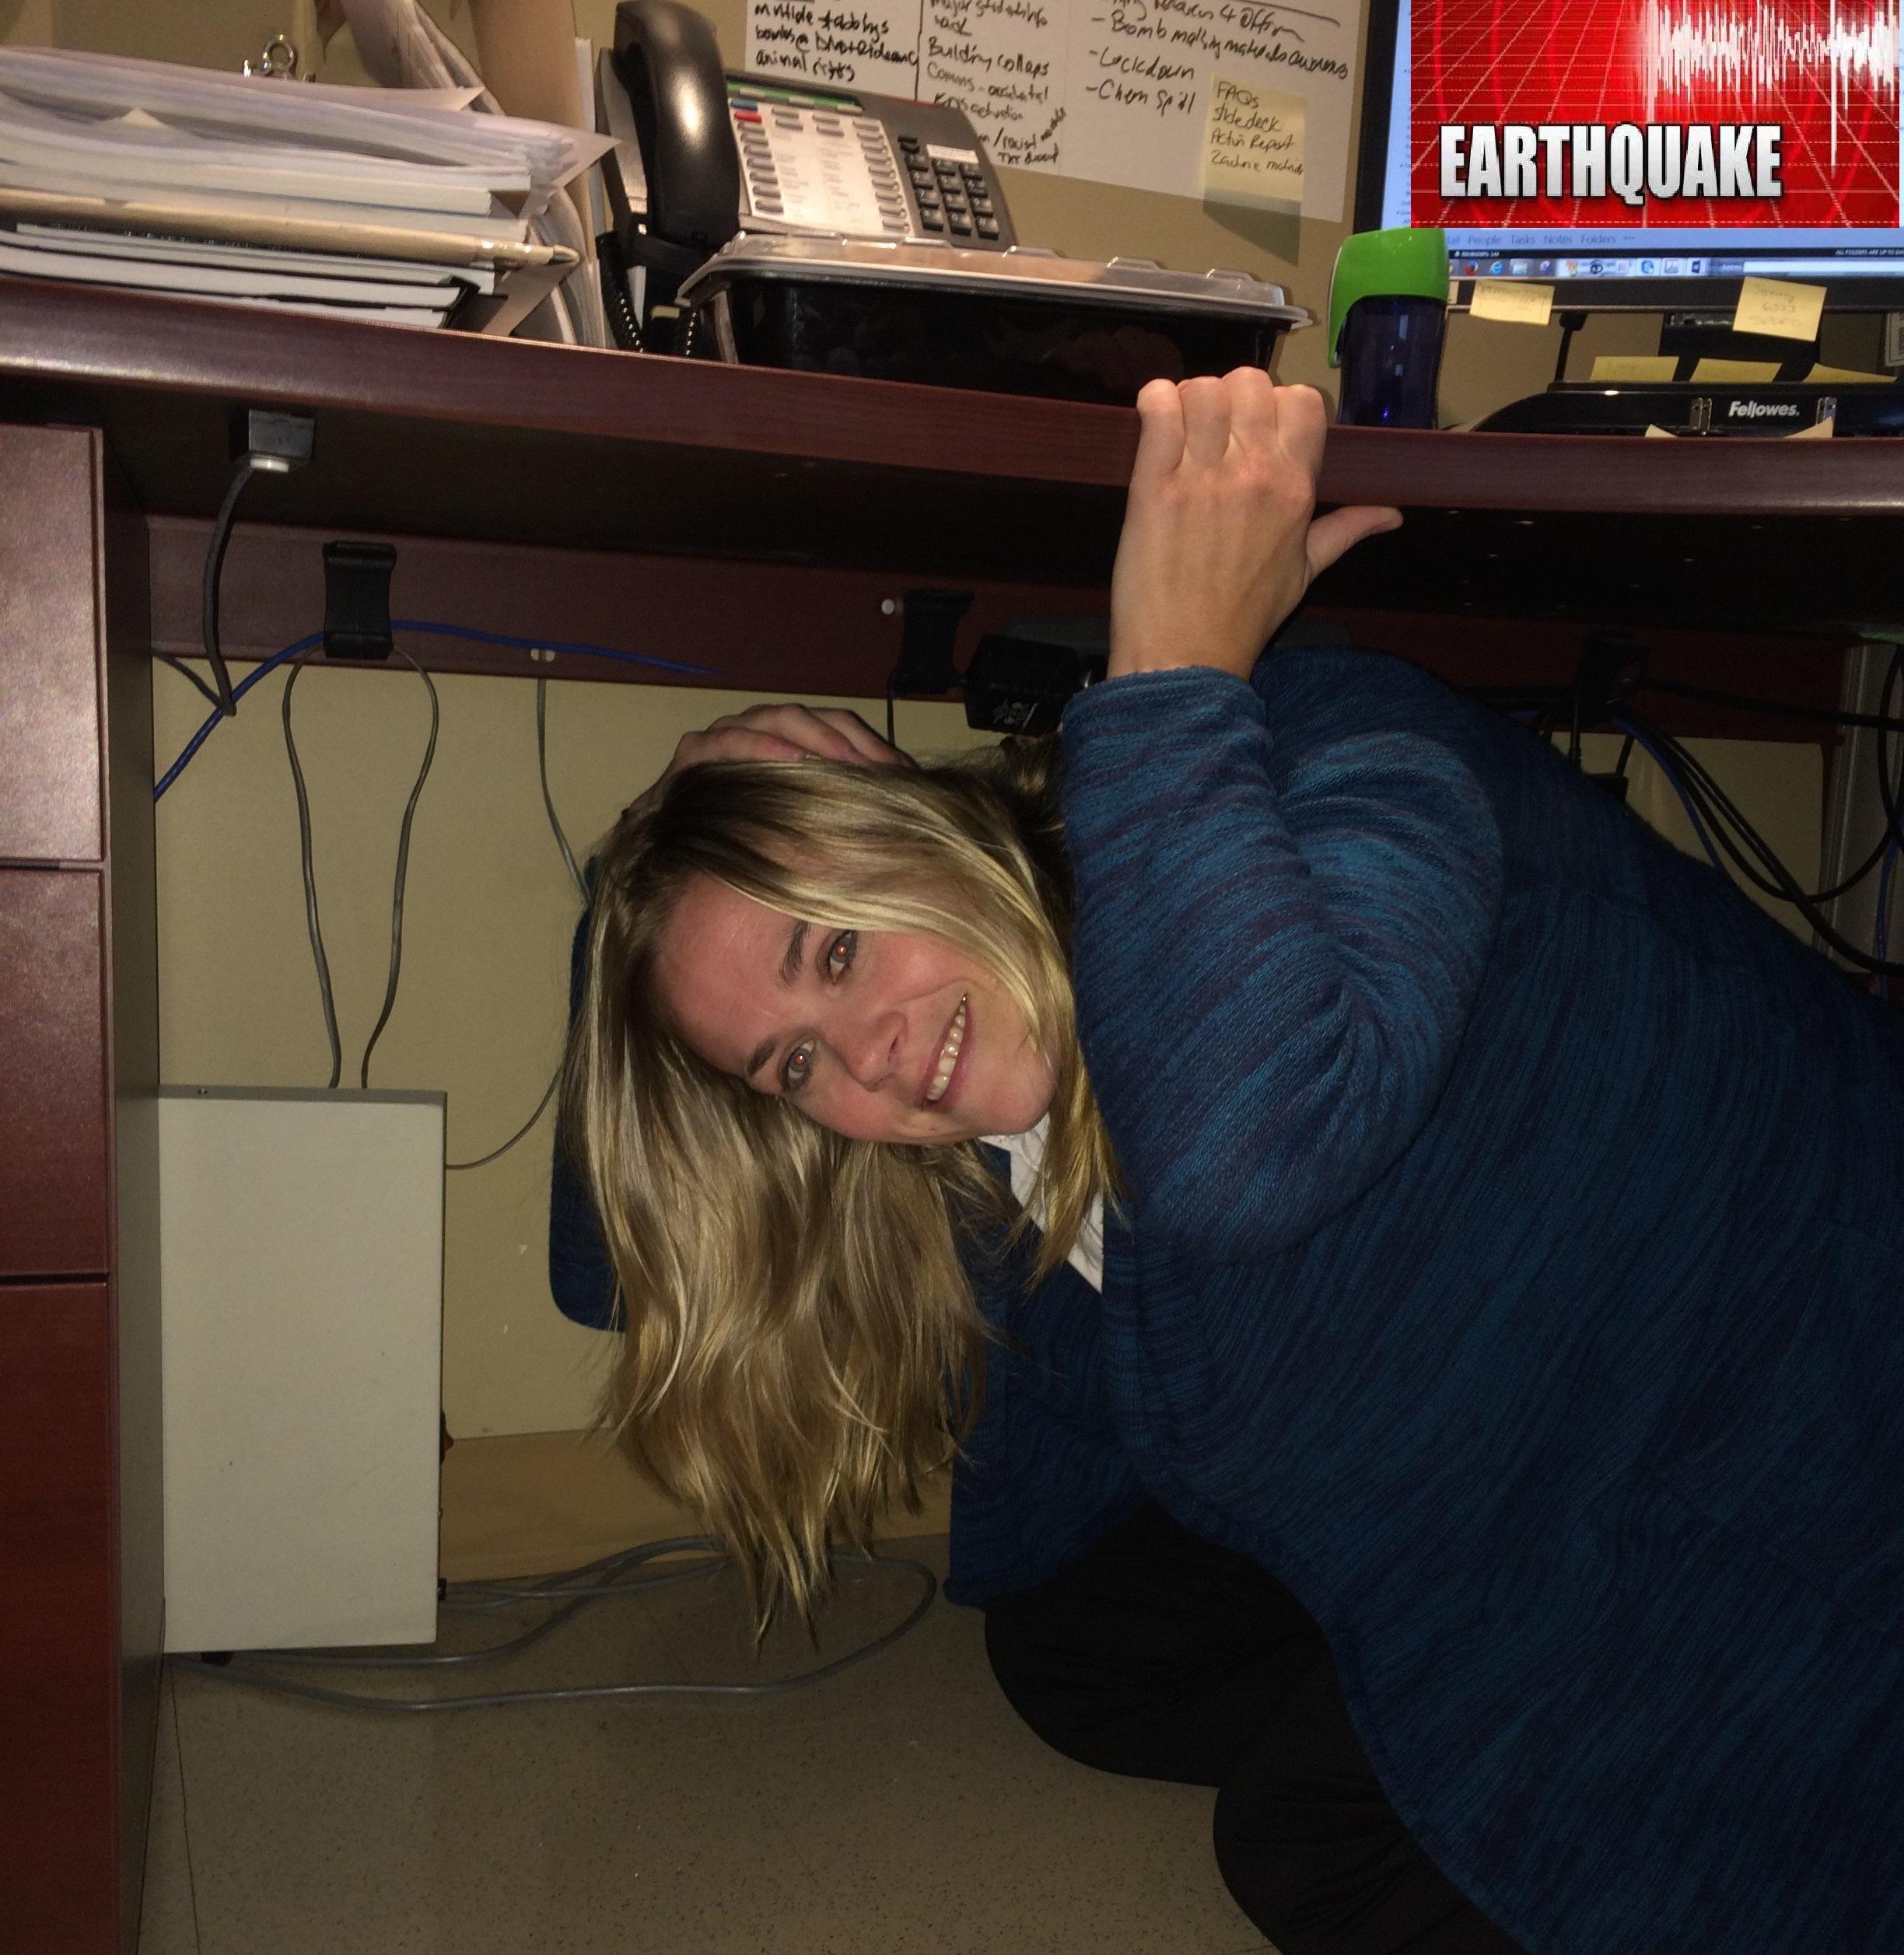 Dana Fleming, Emergency management program coordinator, under her work desk